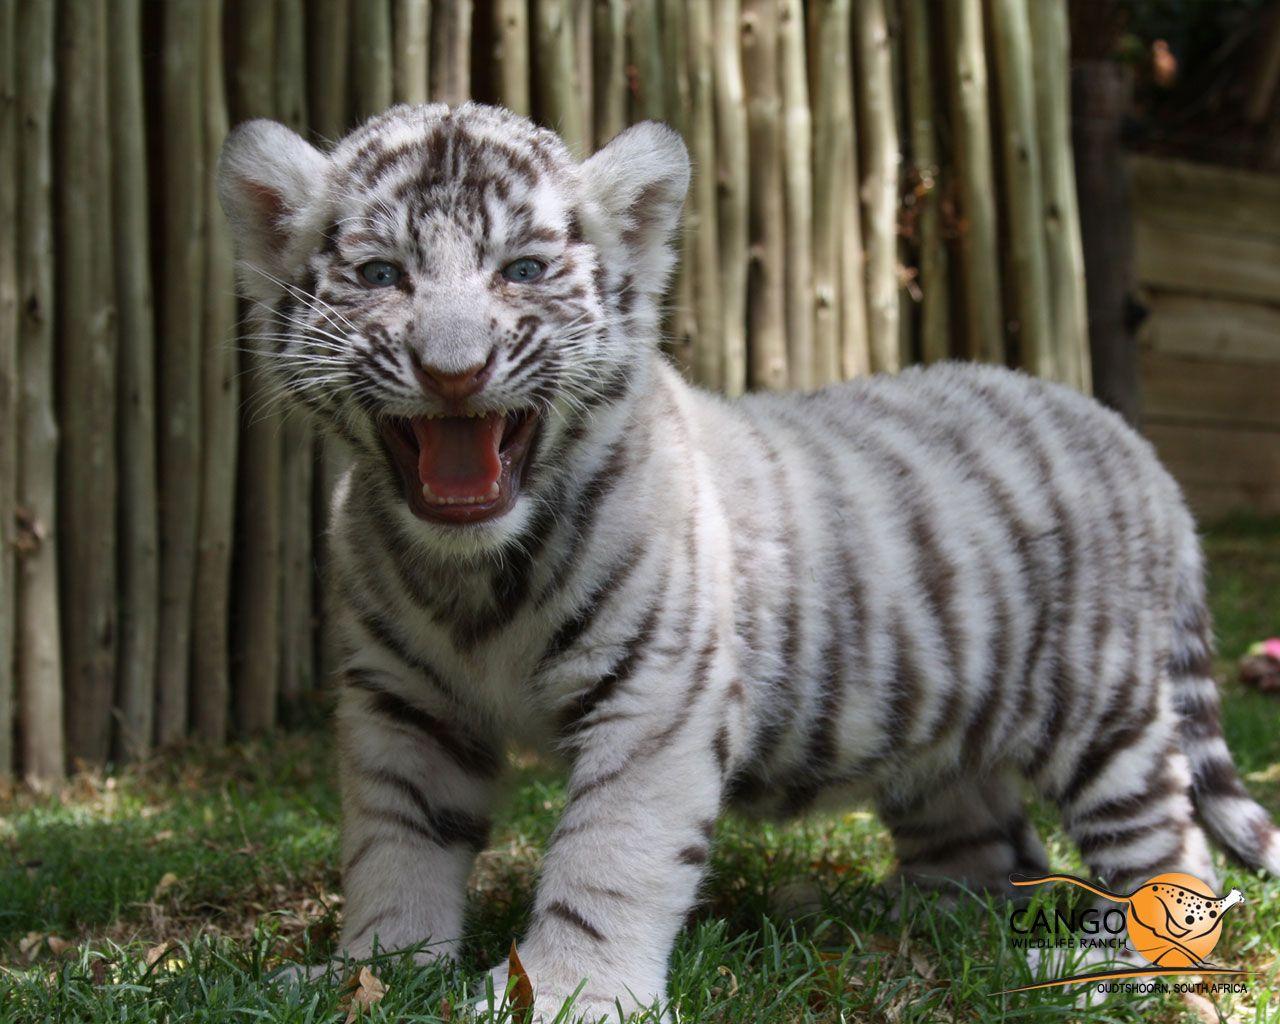 Cute white tiger cubs 1024x768 1280x1024 big cats pinterest cute white tiger cubs 1024x768 1280x1024 thecheapjerseys Image collections